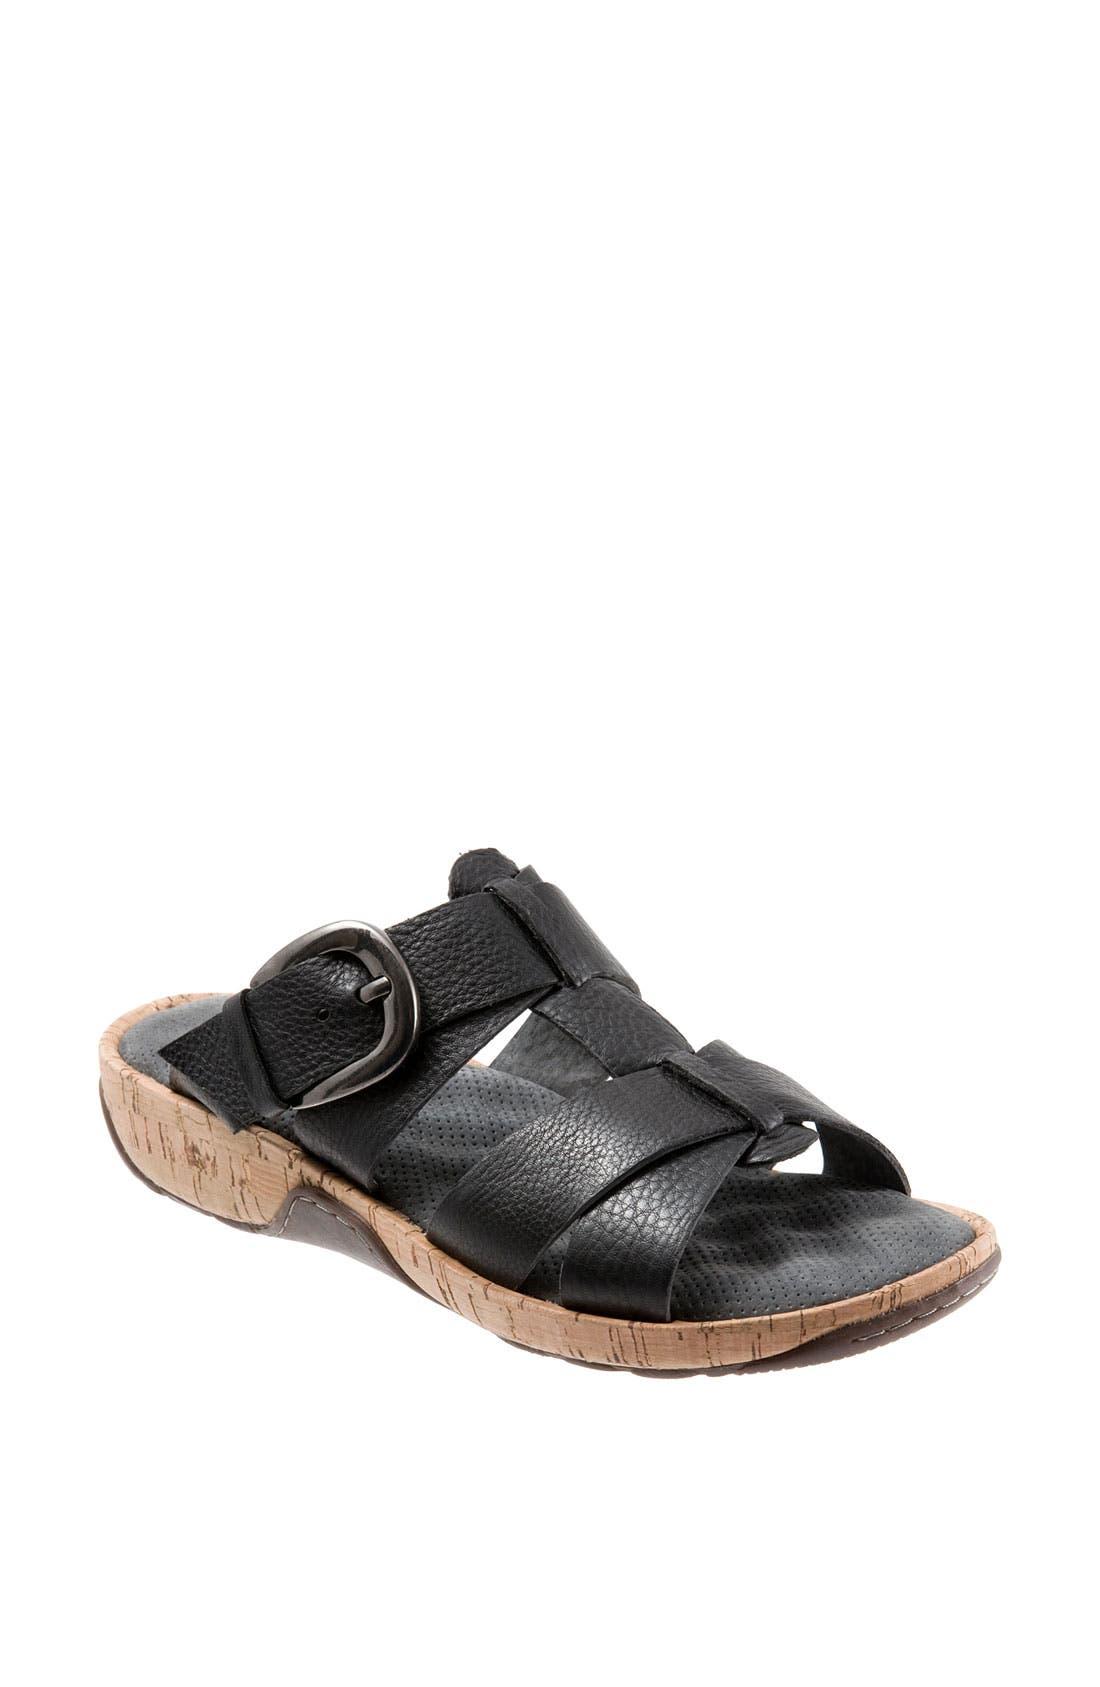 Alternate Image 1 Selected - SoftWalk® 'Berkeley' Sandal